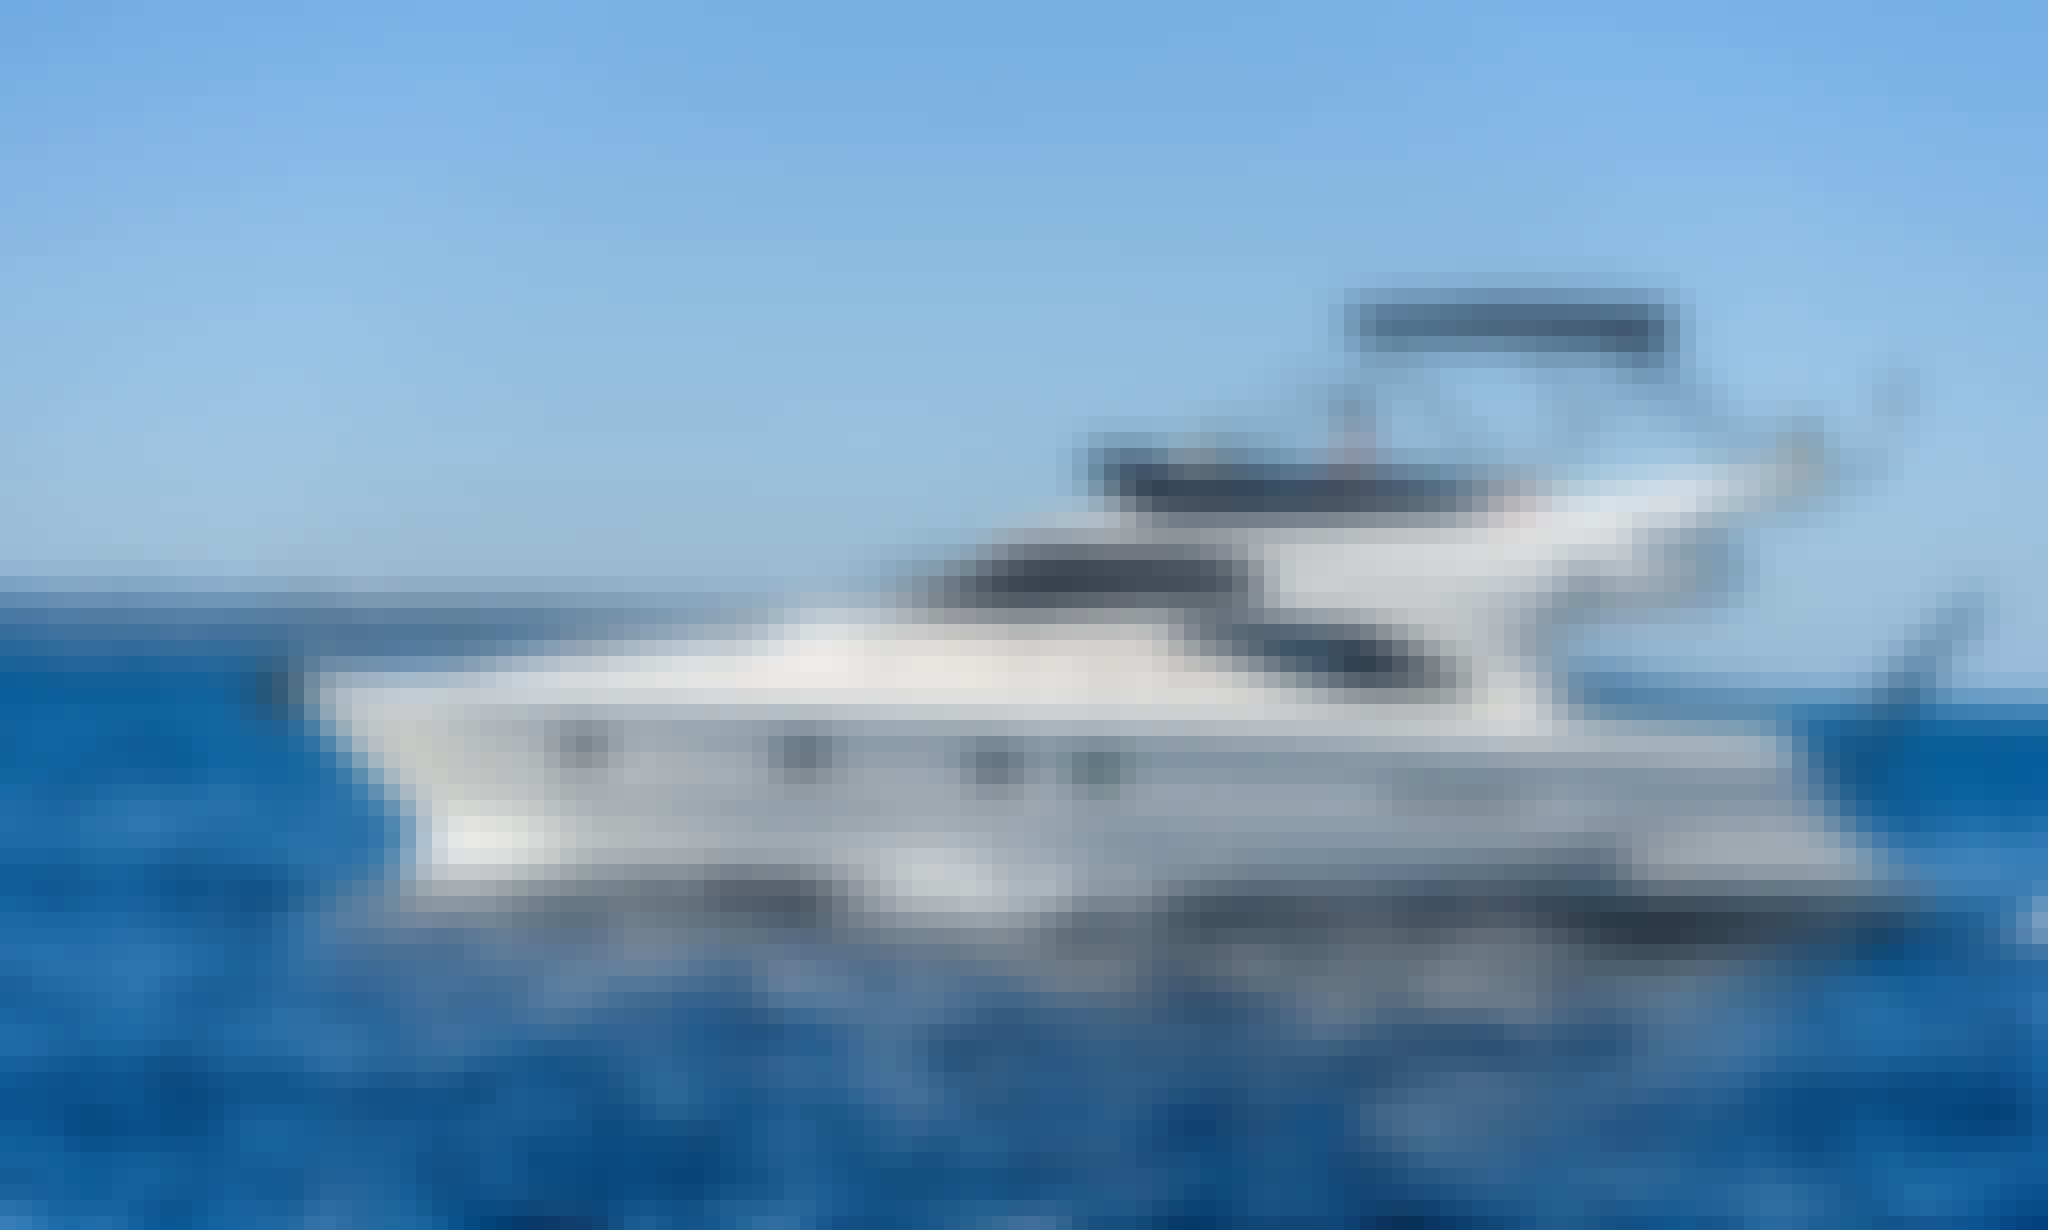 Ferretti 430 Fly Motor Yacht Available for Charter in Split or in Hvar, Croatia